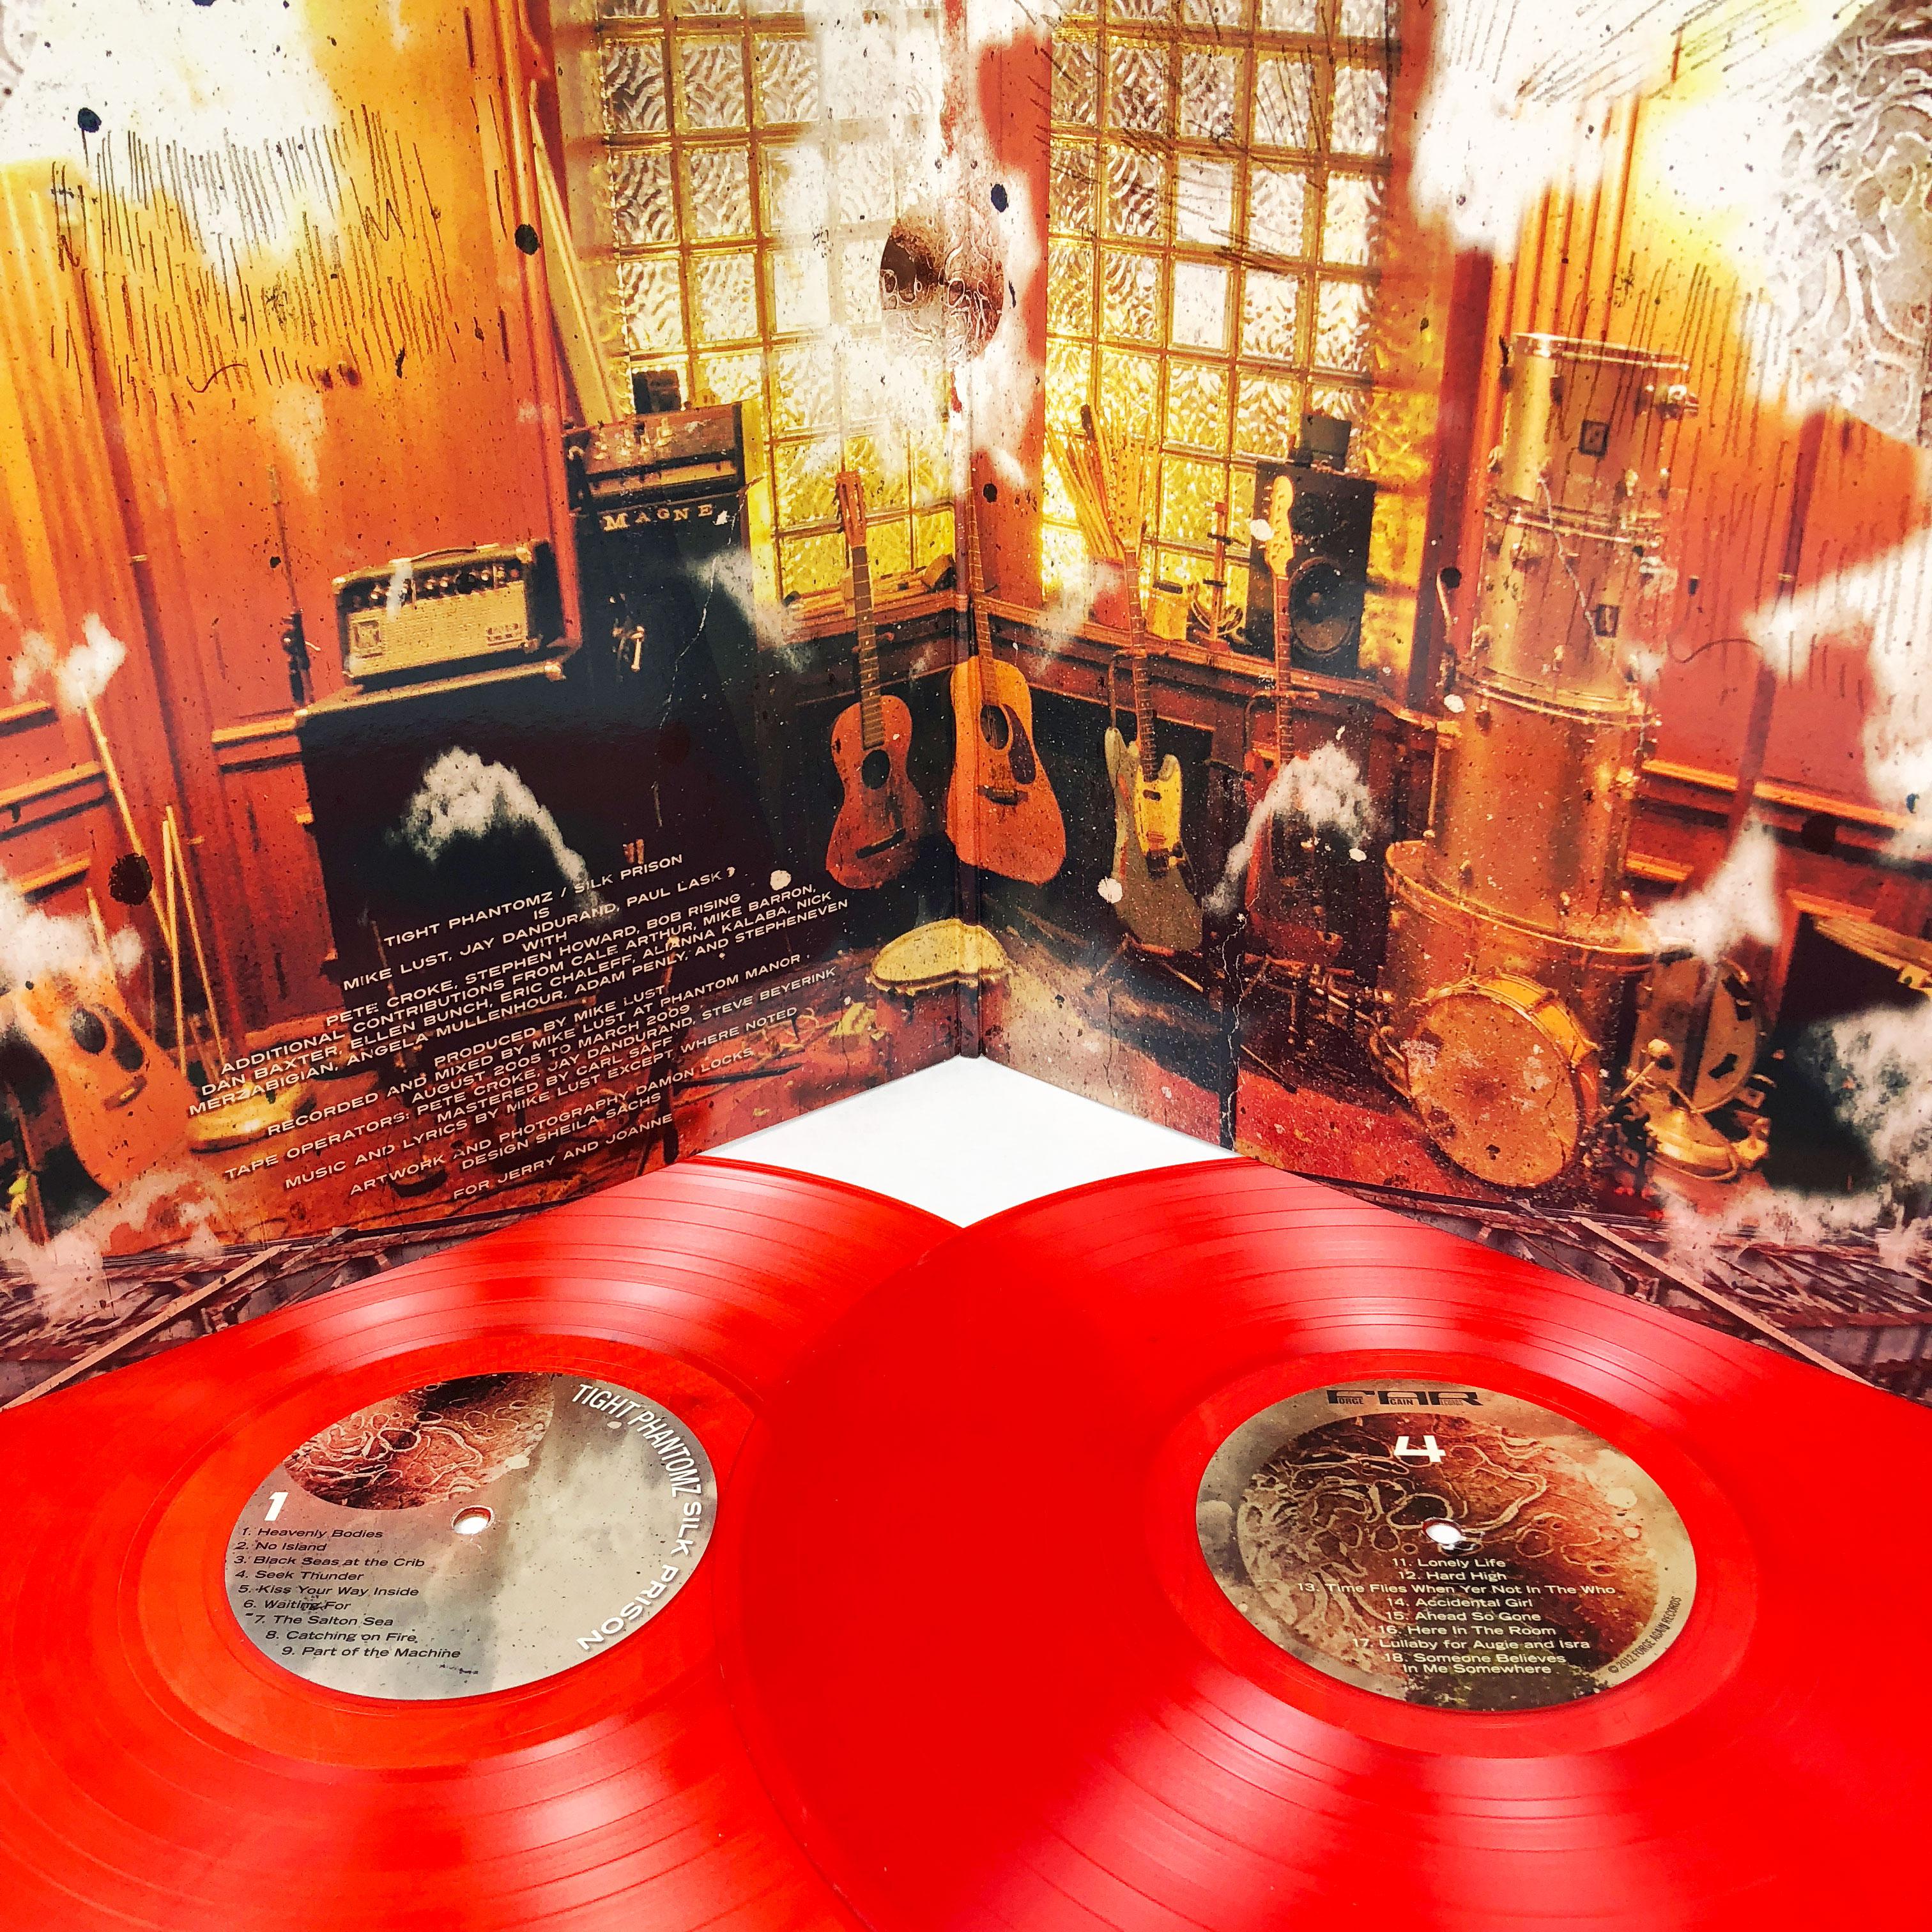 Tight Phantomz Silk Prison 2xlp Handstand Records Kaos Catching Fire